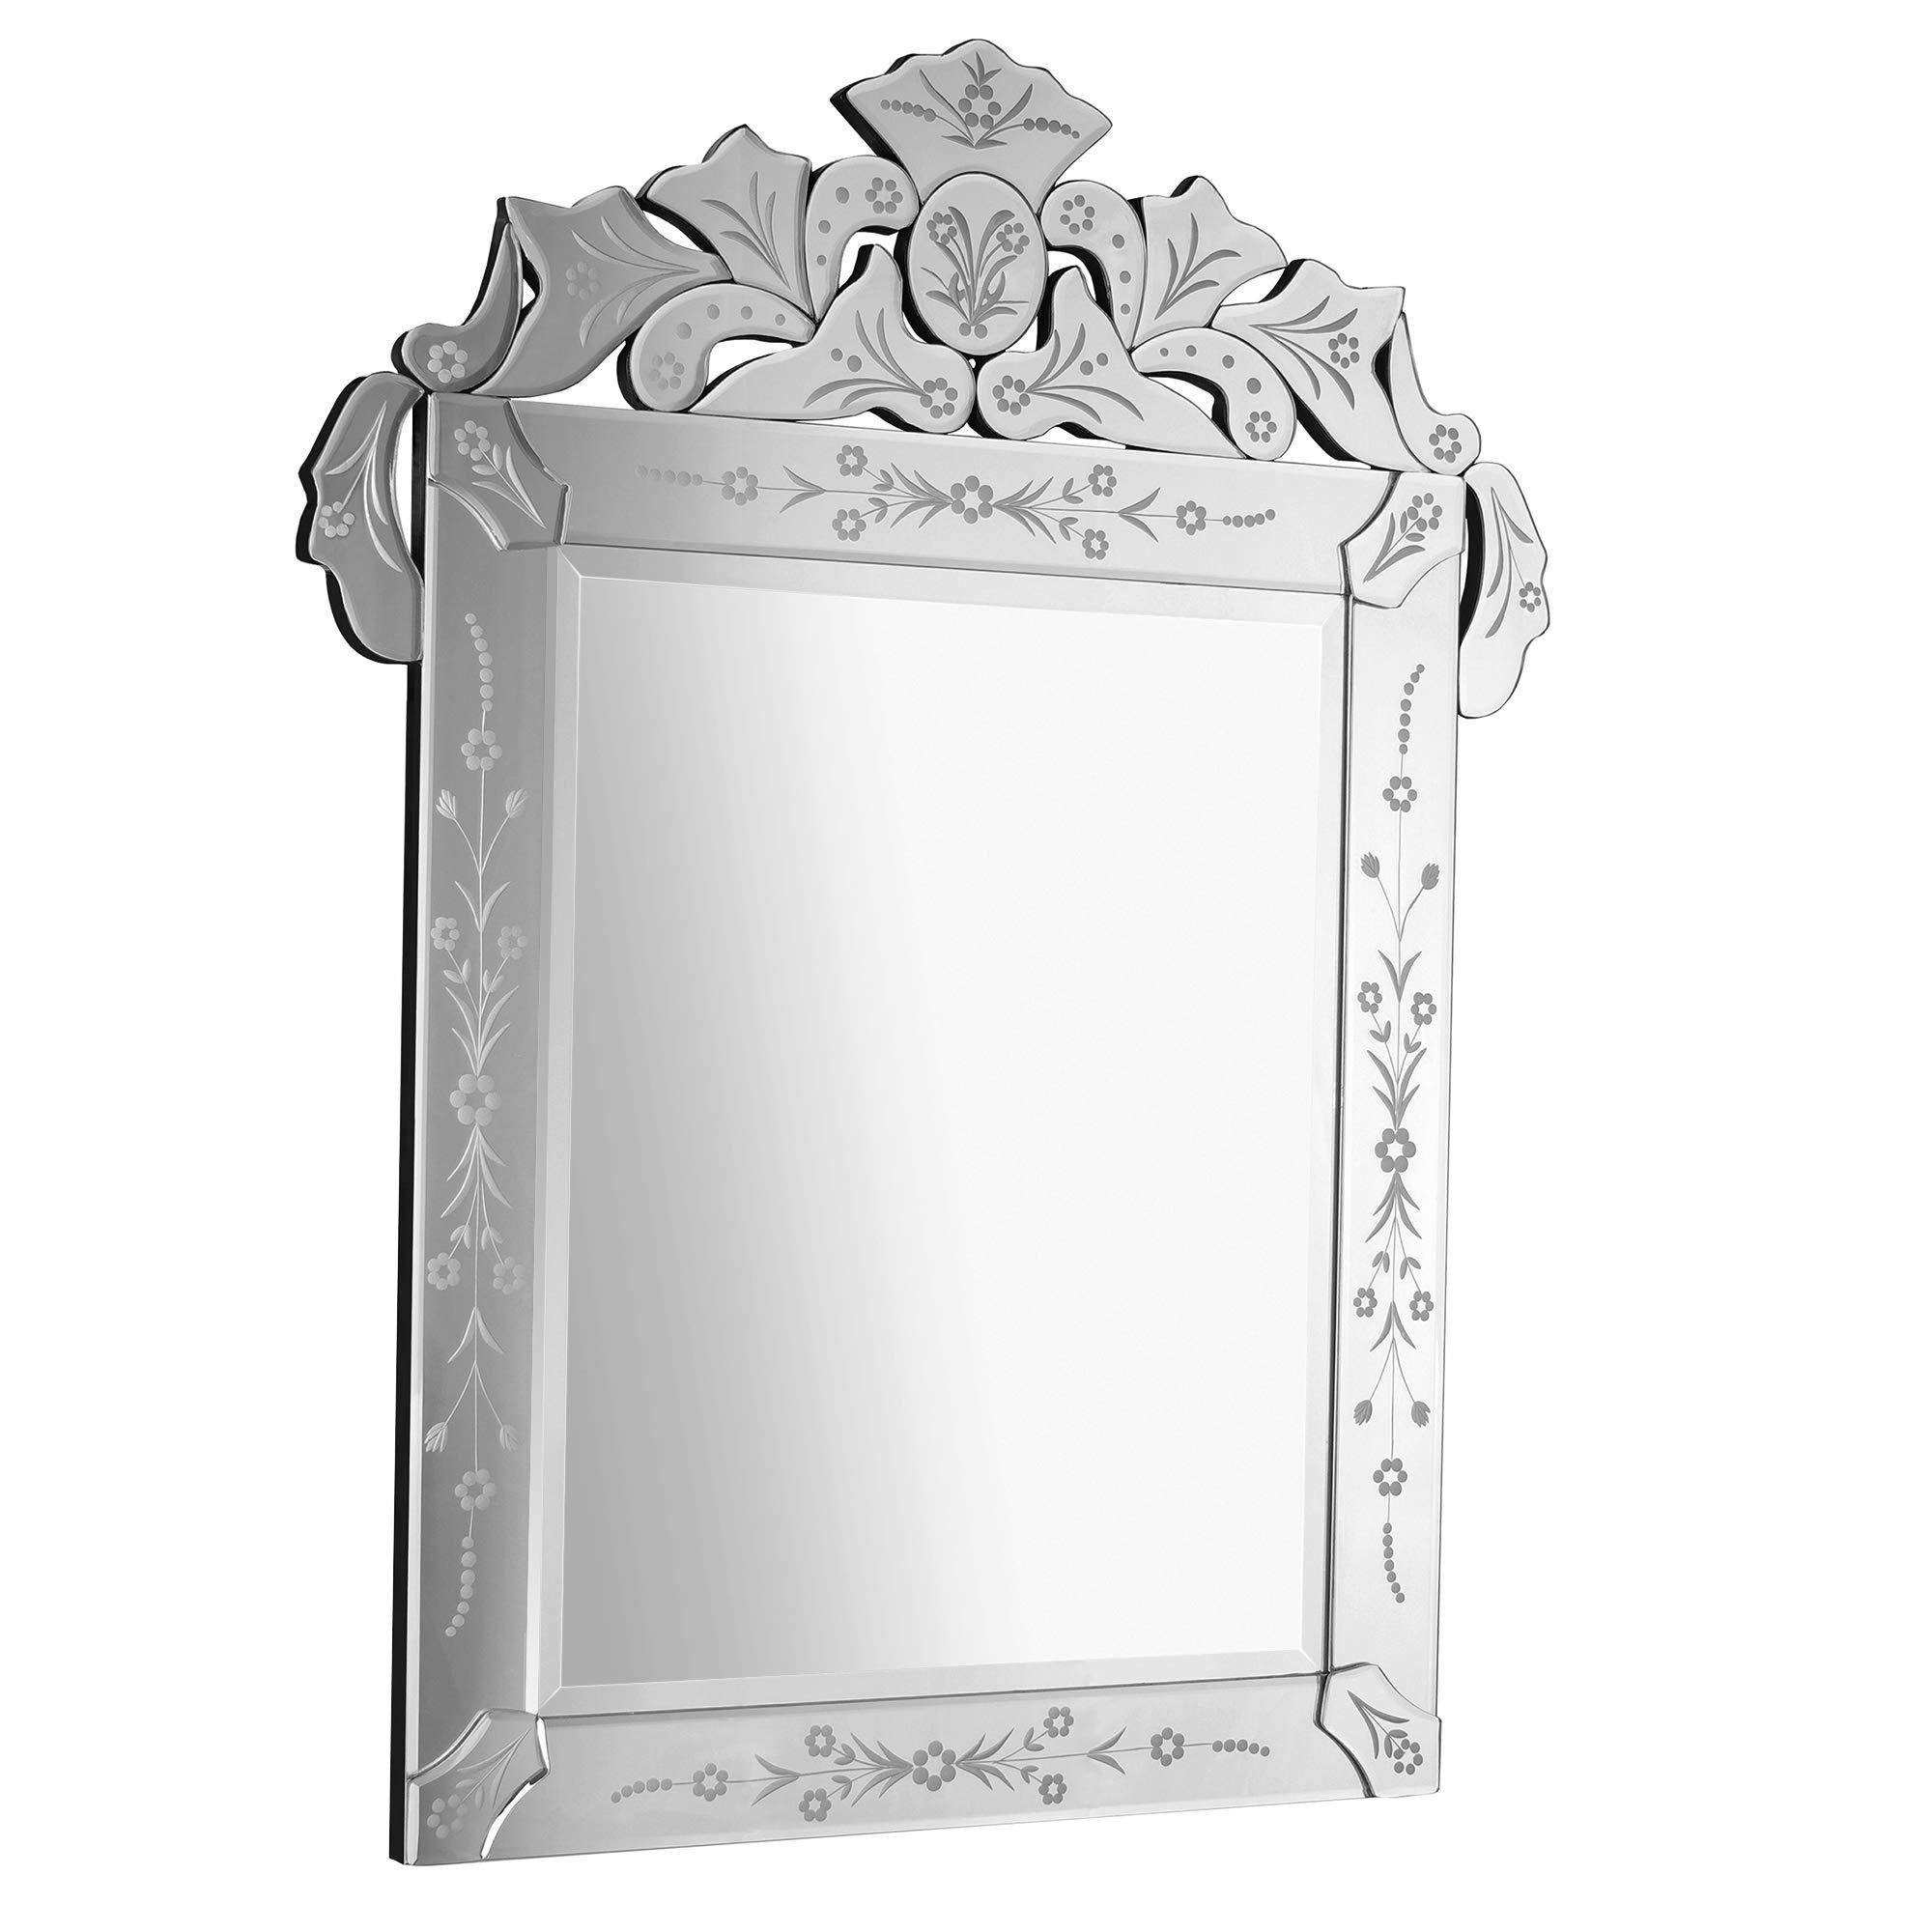 Elegant wall mirrors Large Rose Gold Wall Mirror Trend Venetian Mirrors Elegant Wall Mirrors Bedroom Mirror For Wall Decor 28 Ebay Mirror Trend Venetian Mirrors Elegant Wall Mirrors Bedroom